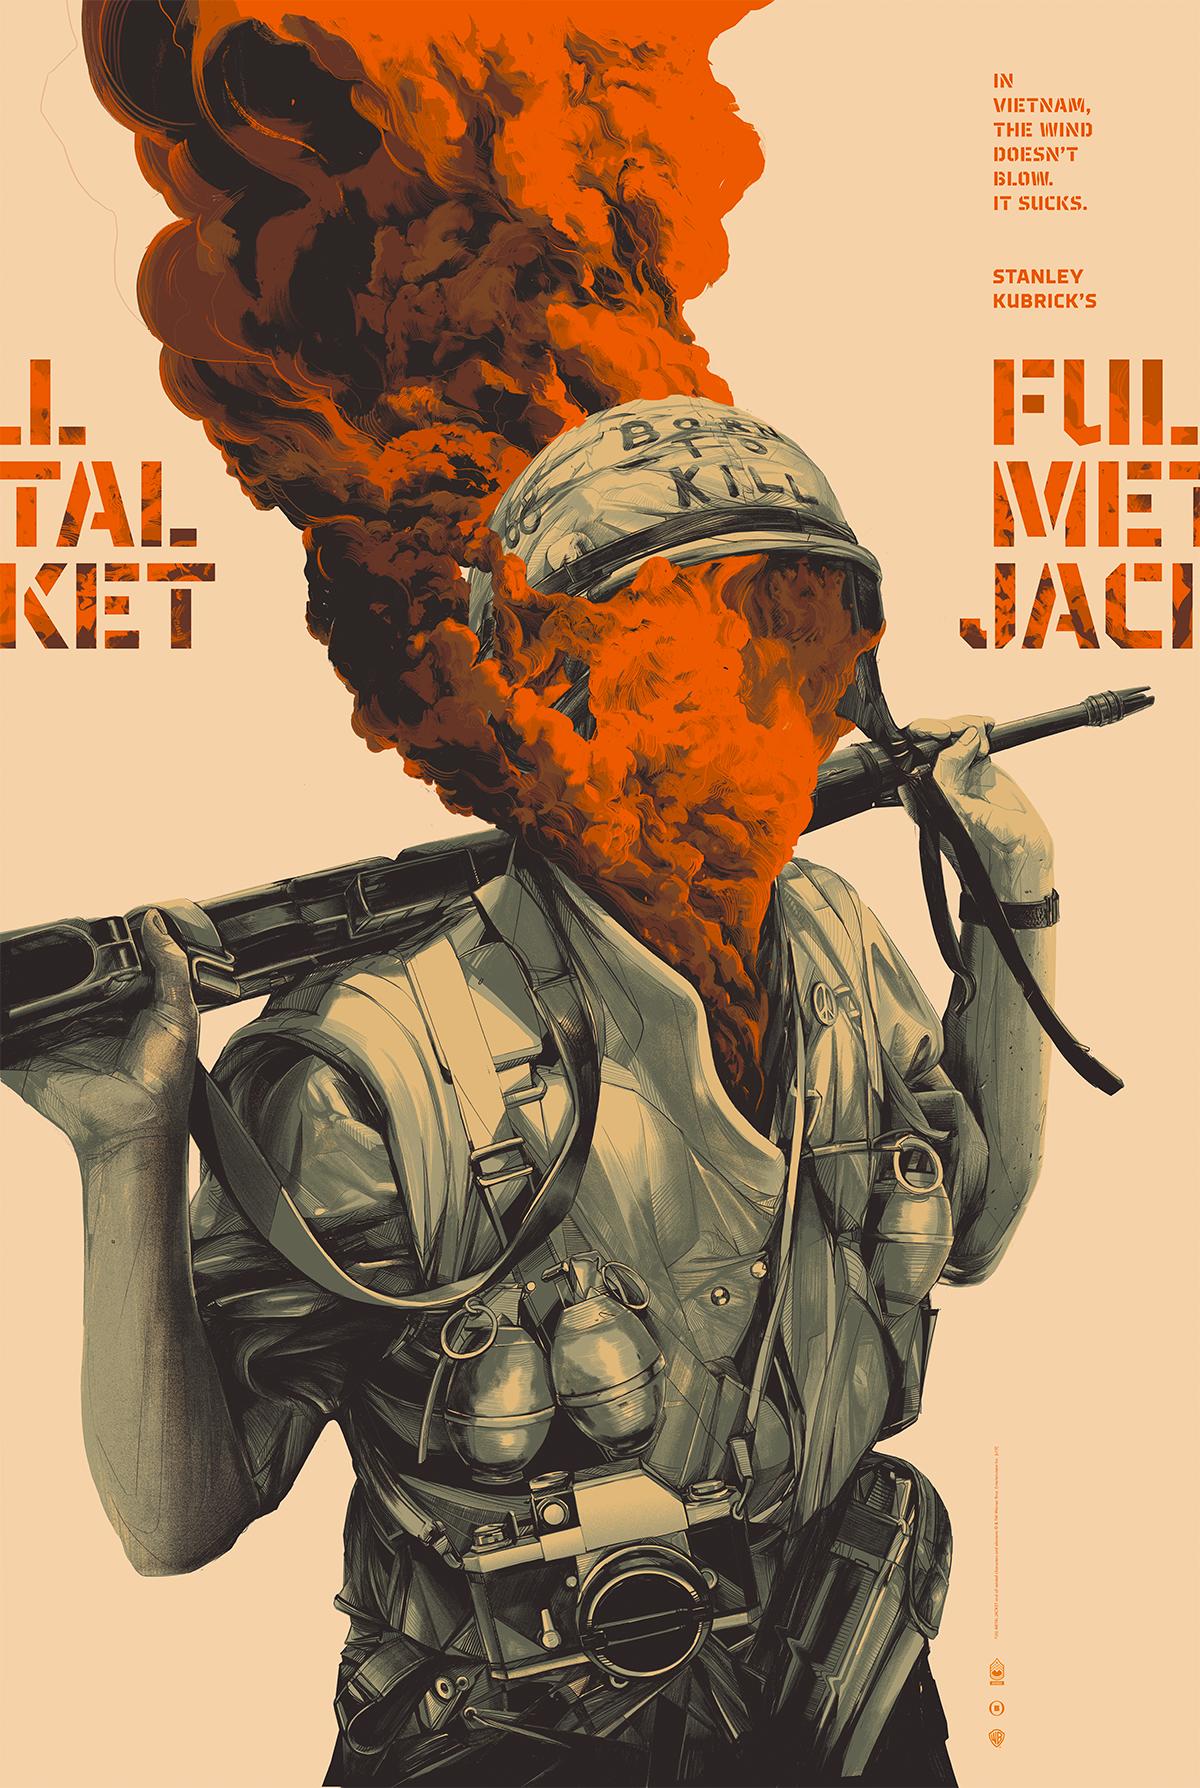 FULL METAL JACKET - Mondo / Warner Bros.Limited edition, screen-printed film poster.